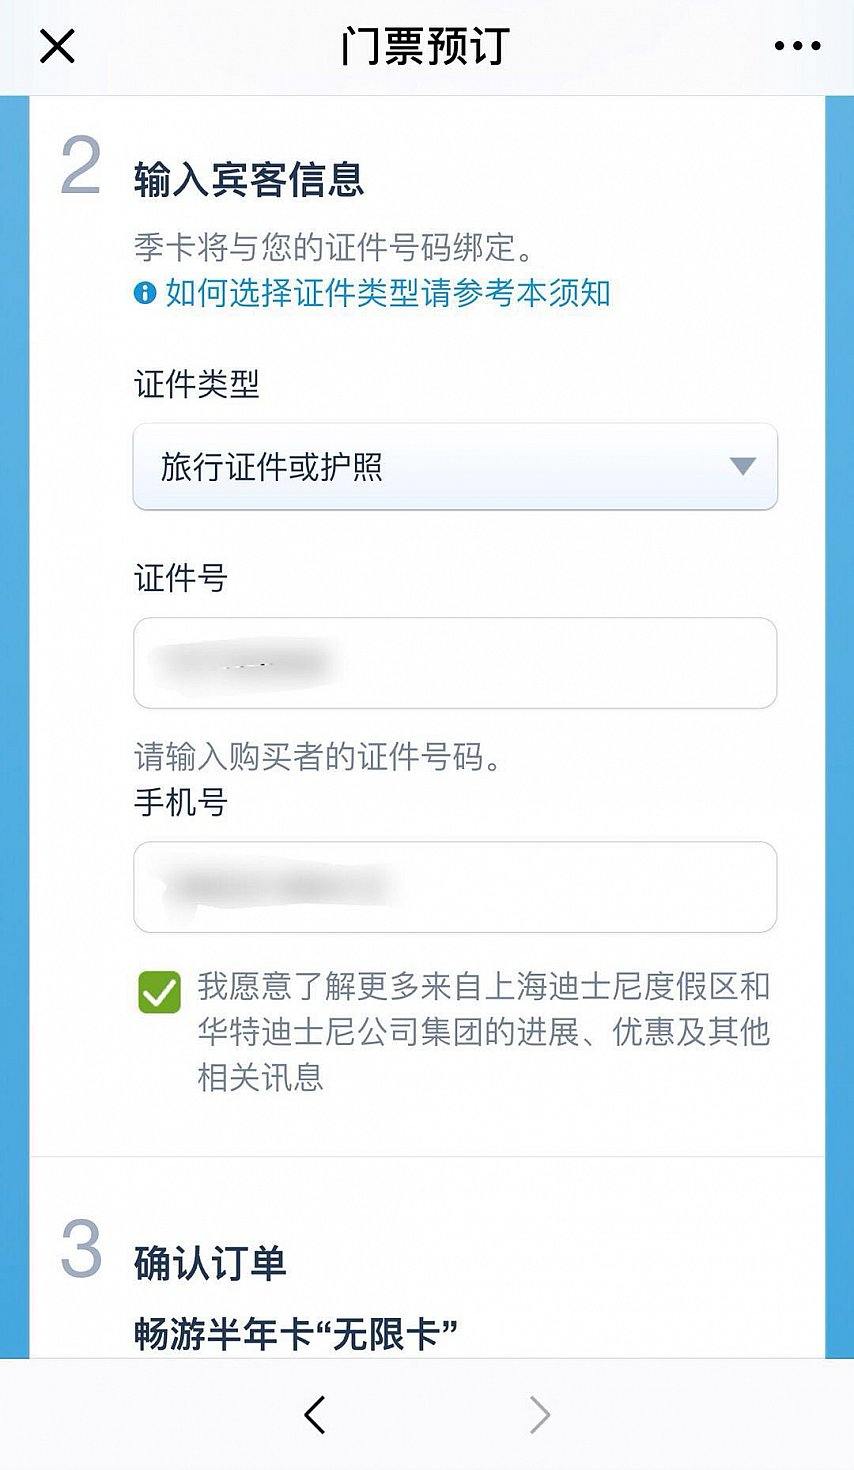 Wechat(微信)から外国人も購入できるようです。 (C) Disney